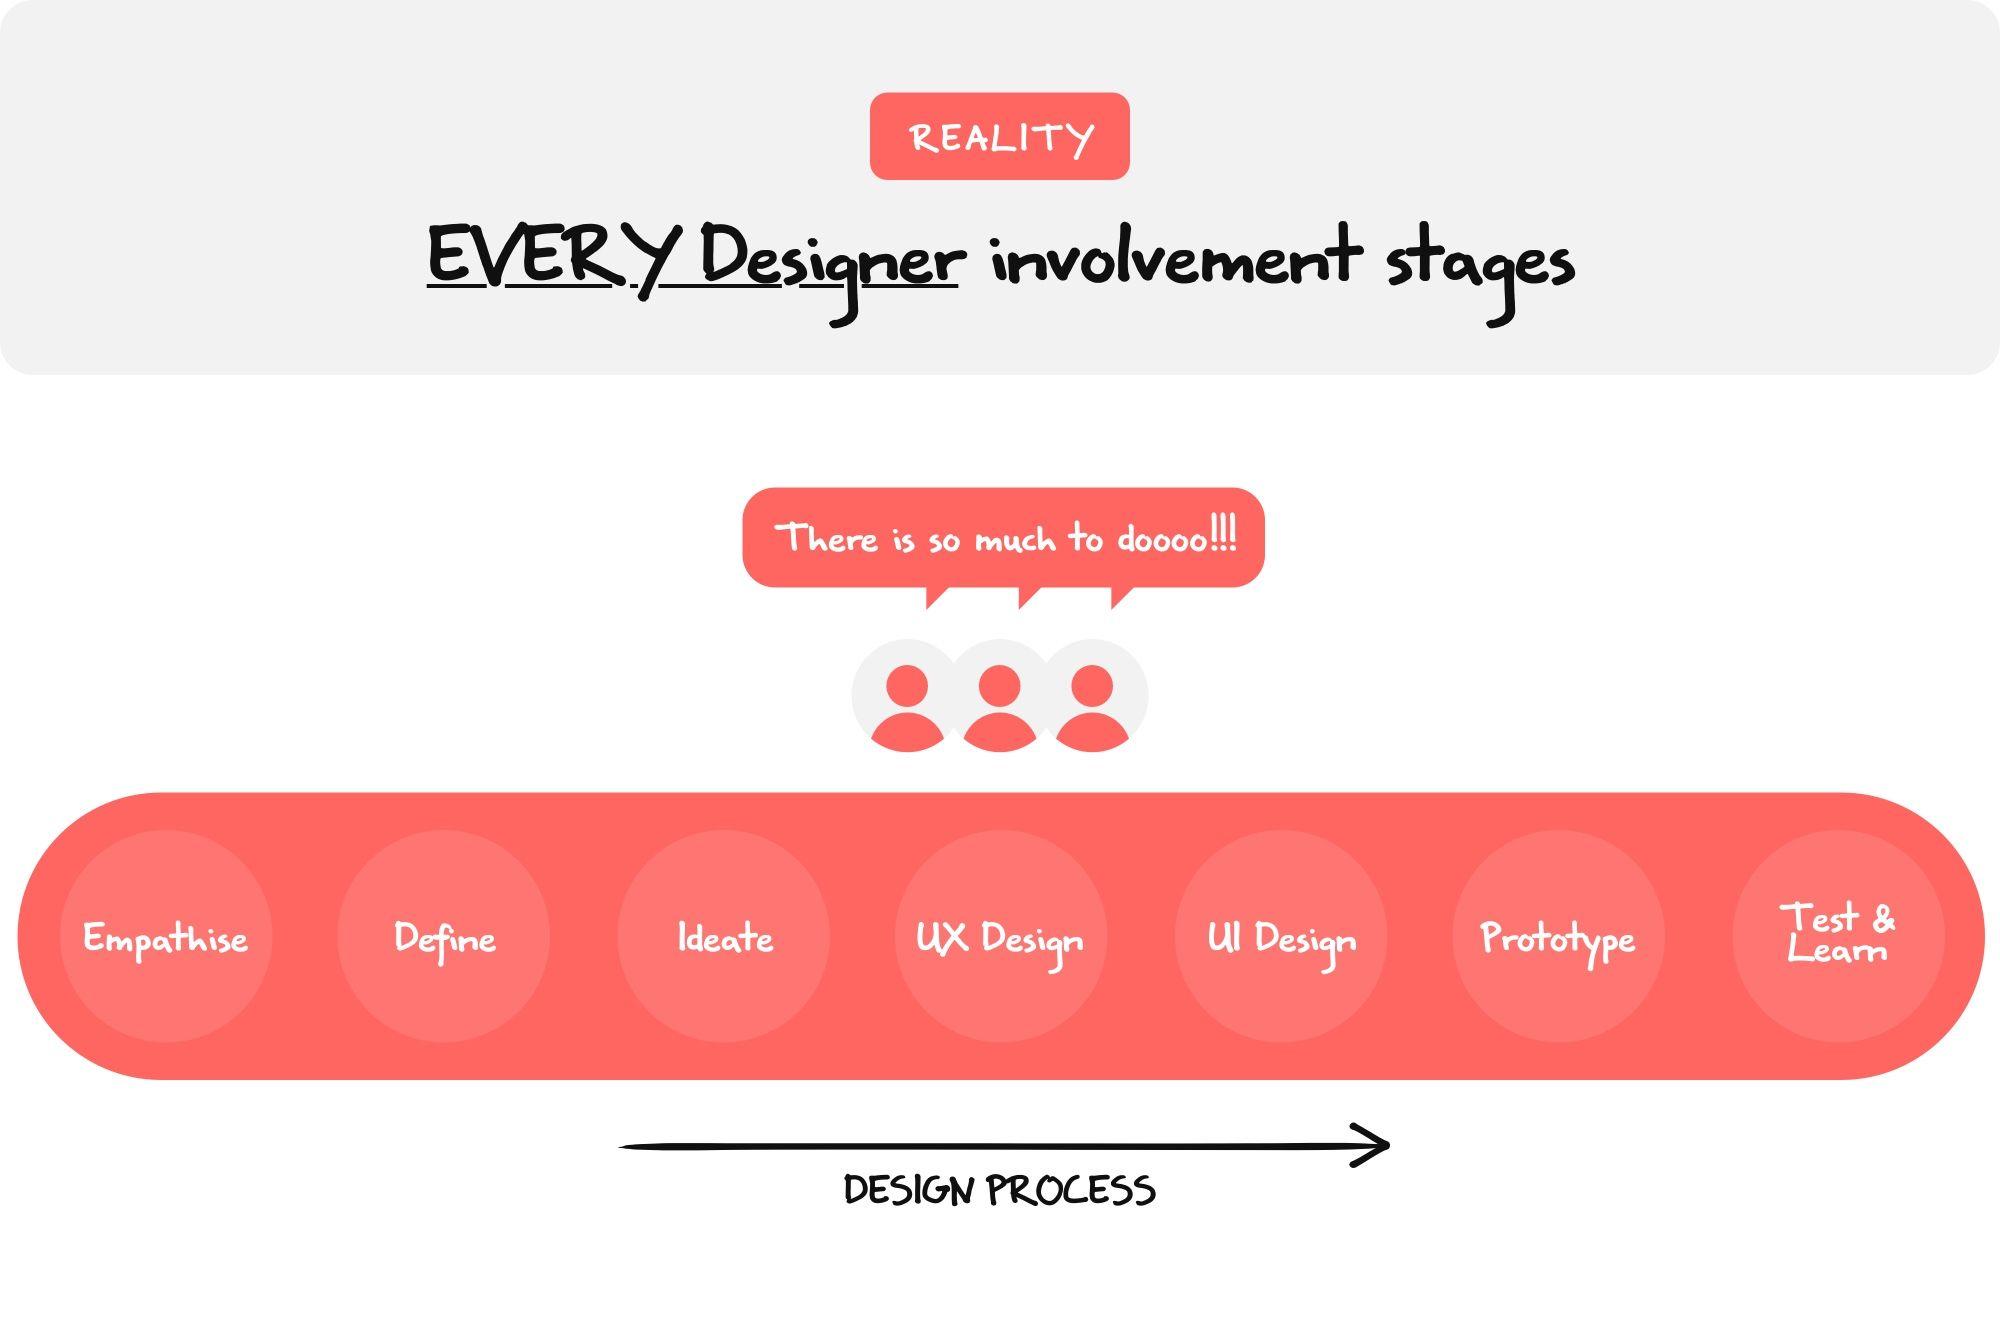 Every designer